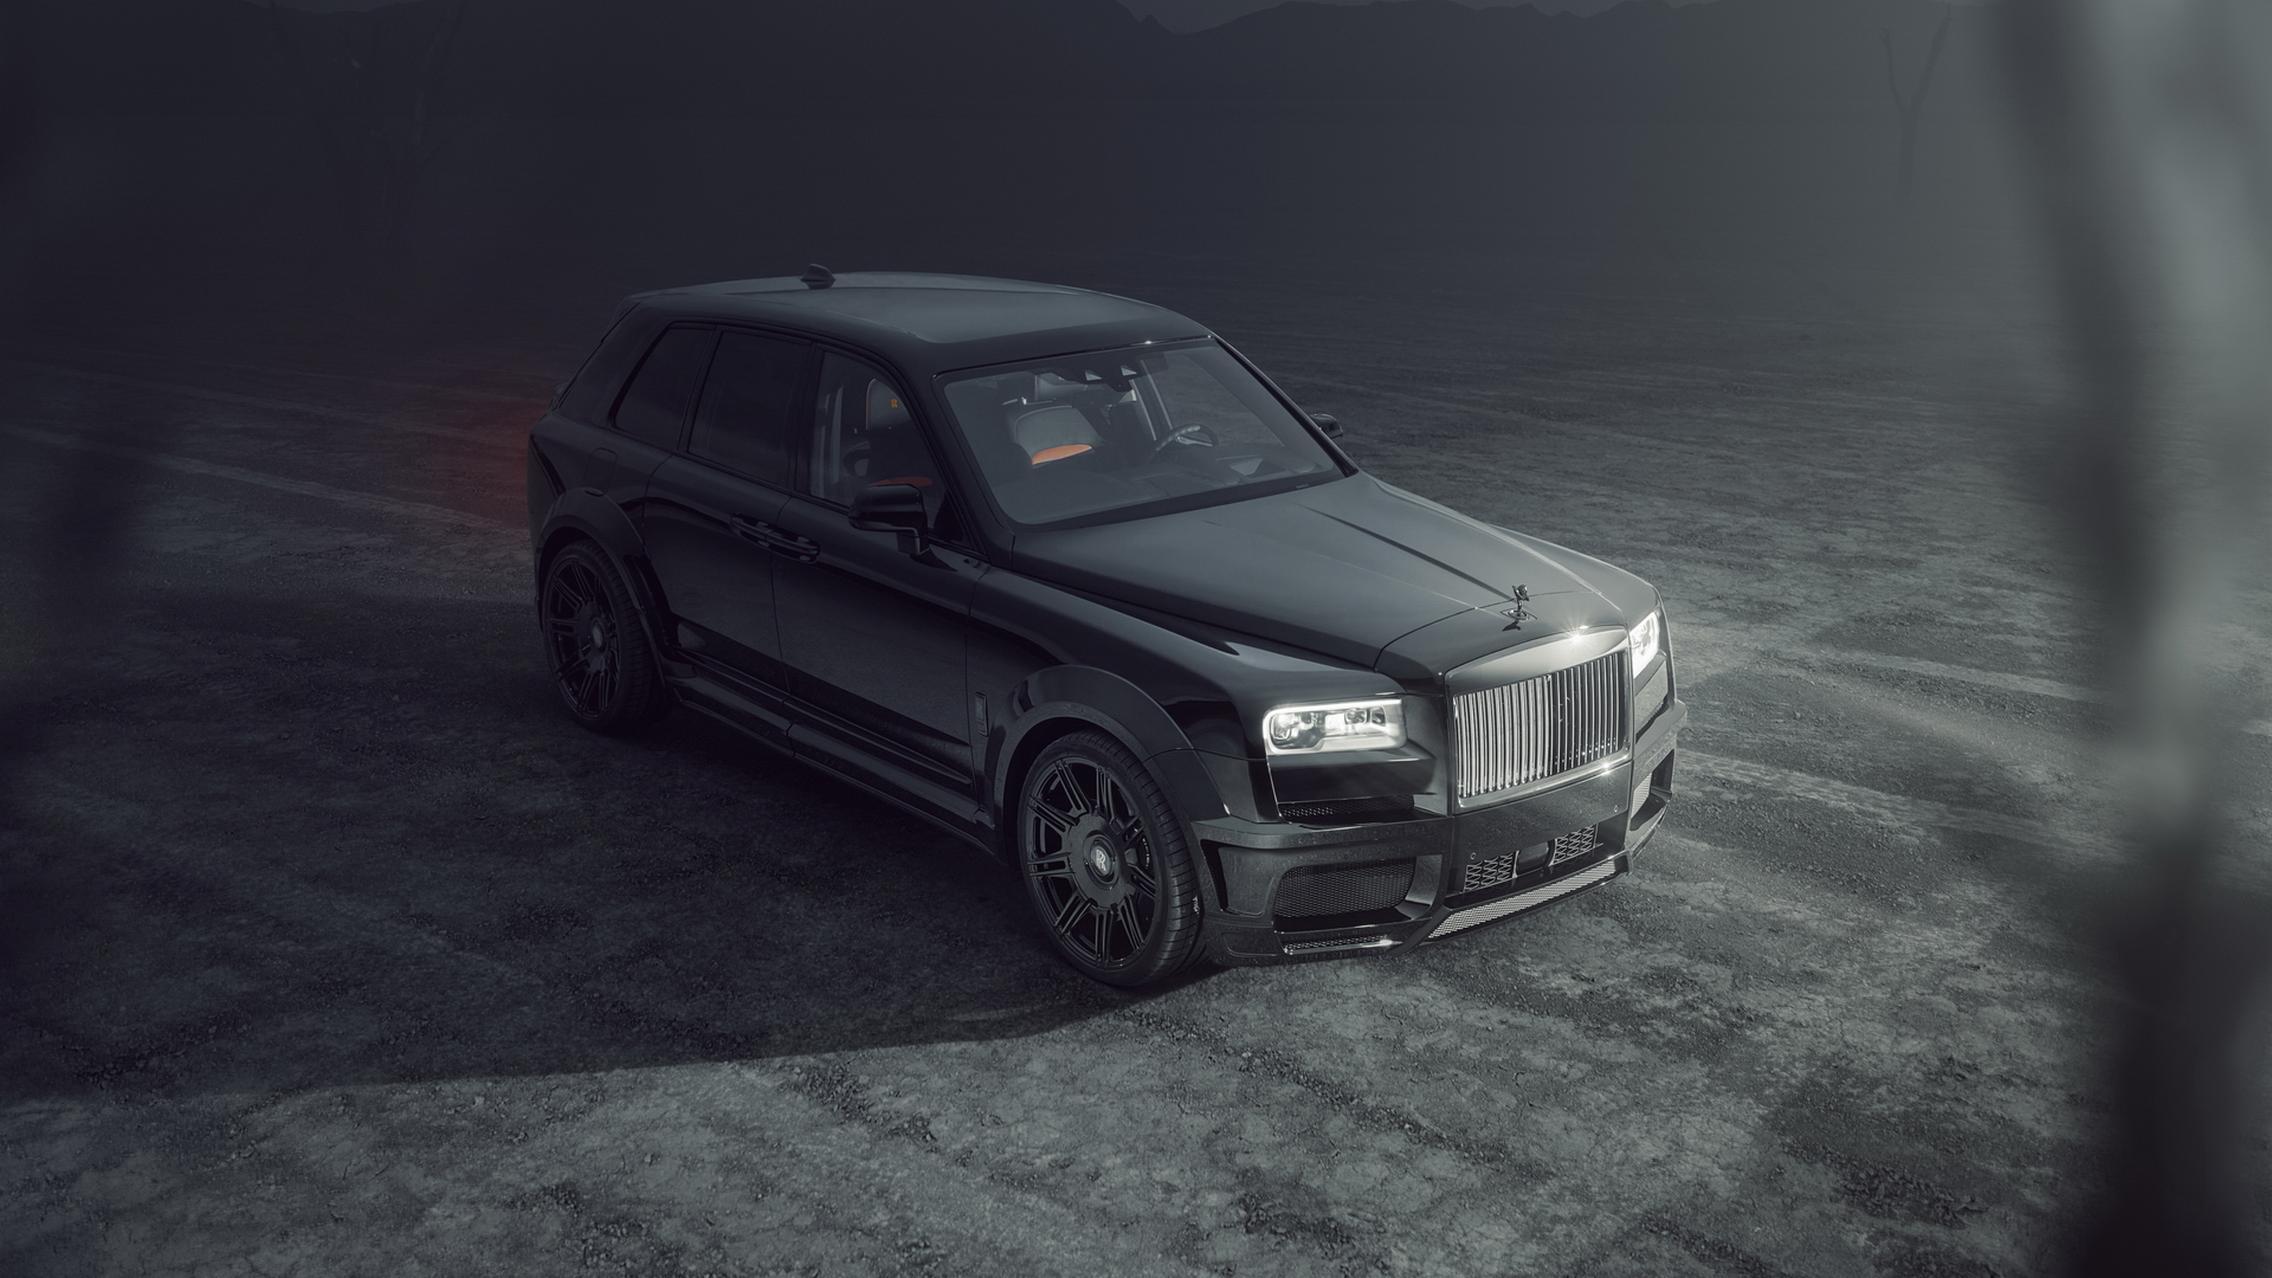 Widebody Rolls-Royce Cullinan price